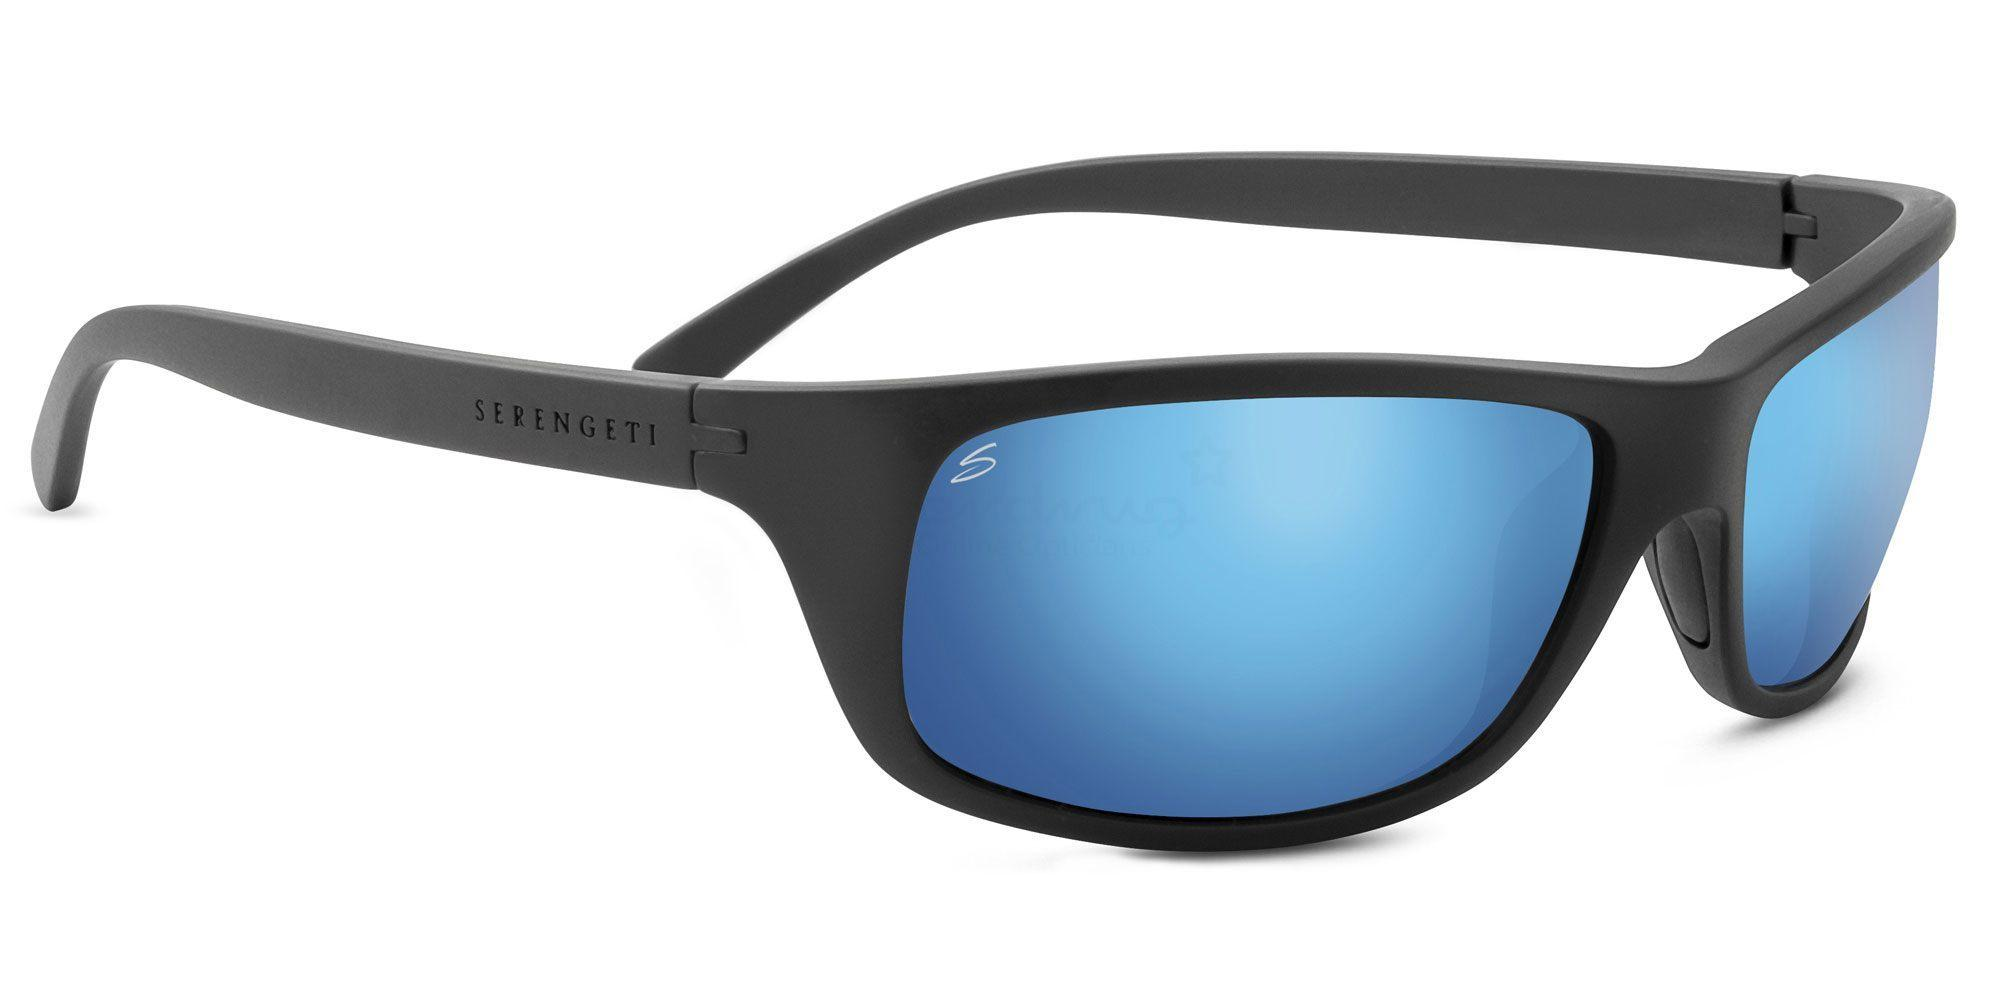 8165 Serengeti BORMIO Sunglasses, Serengeti